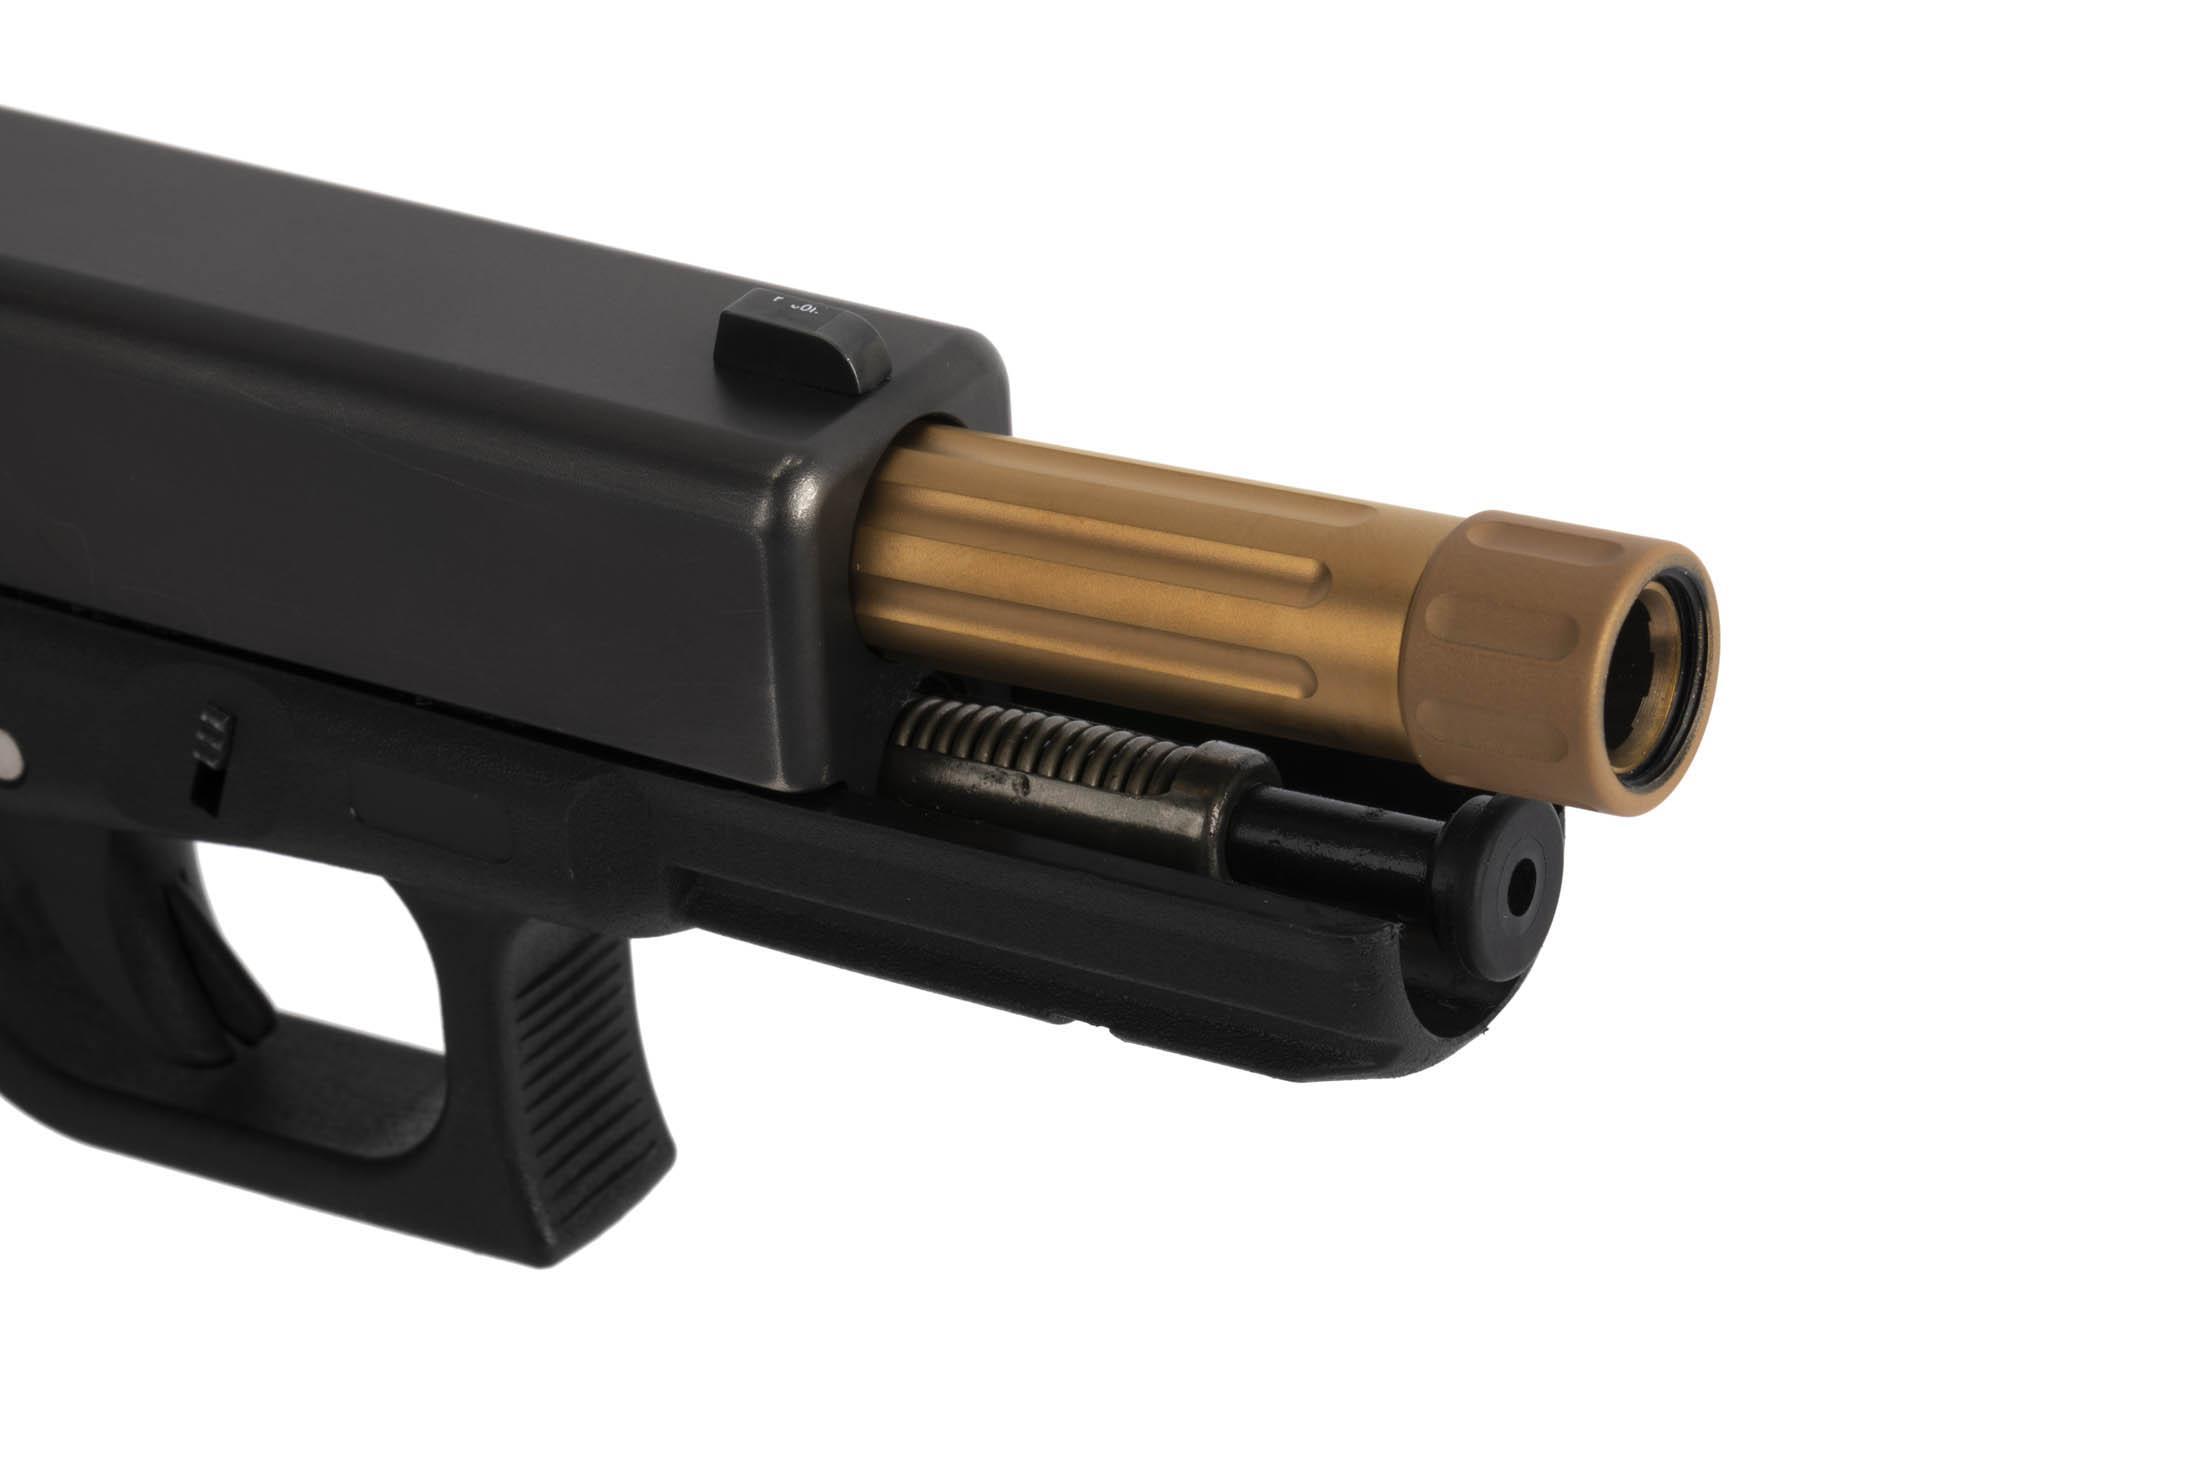 CMC Triggers Glock 17 Gen3-4 Fluted Threaded Barrel - Bronze TiCN